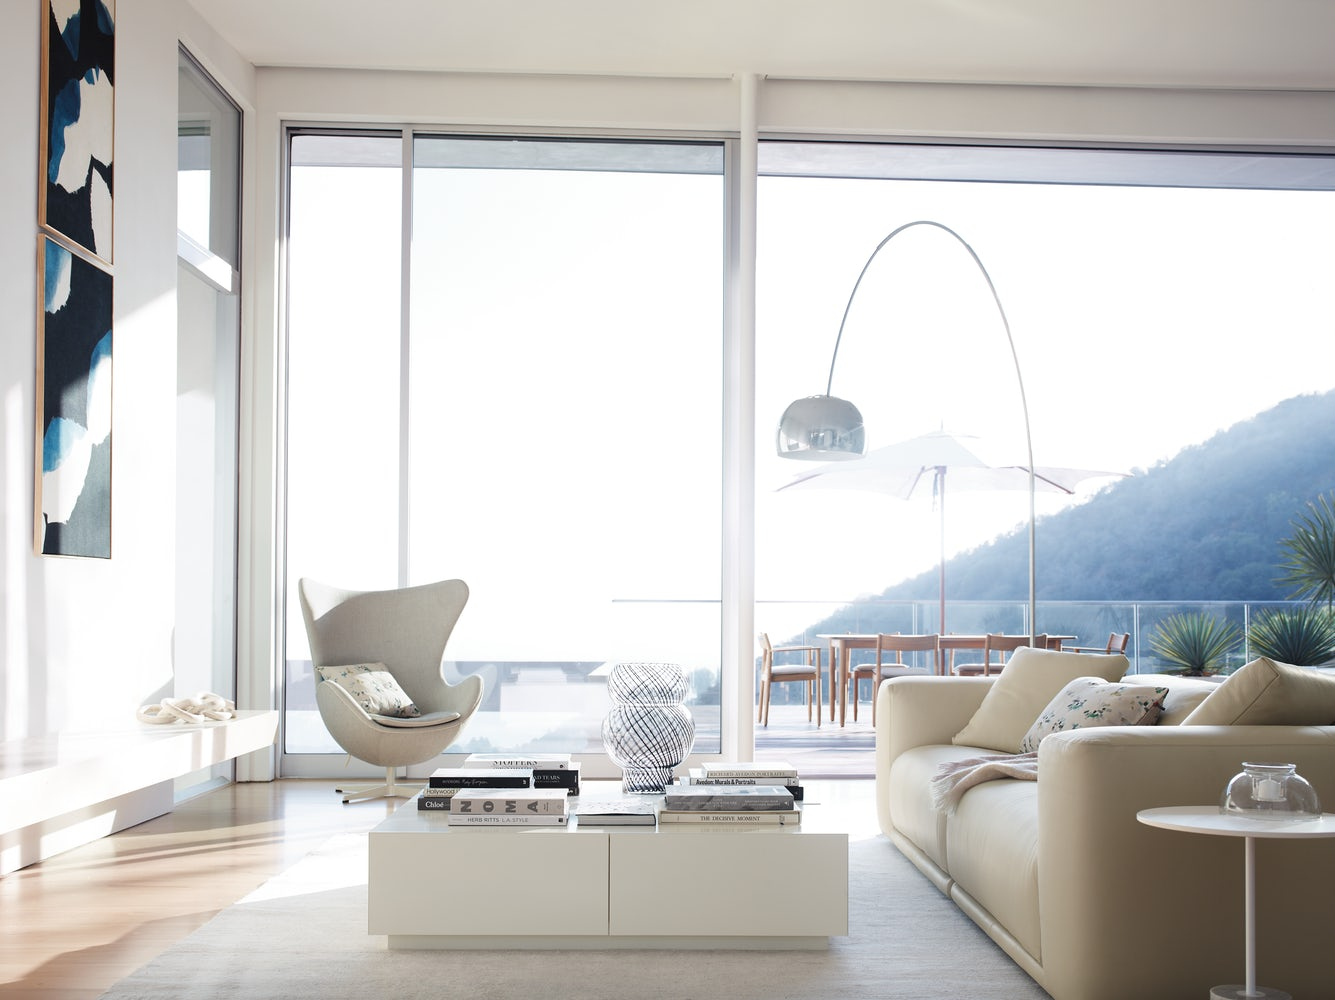 designer-white-coffee-table-with-storage-minimalistic-modern-living-room-furniture-design-multipurpose-luxury-furniture